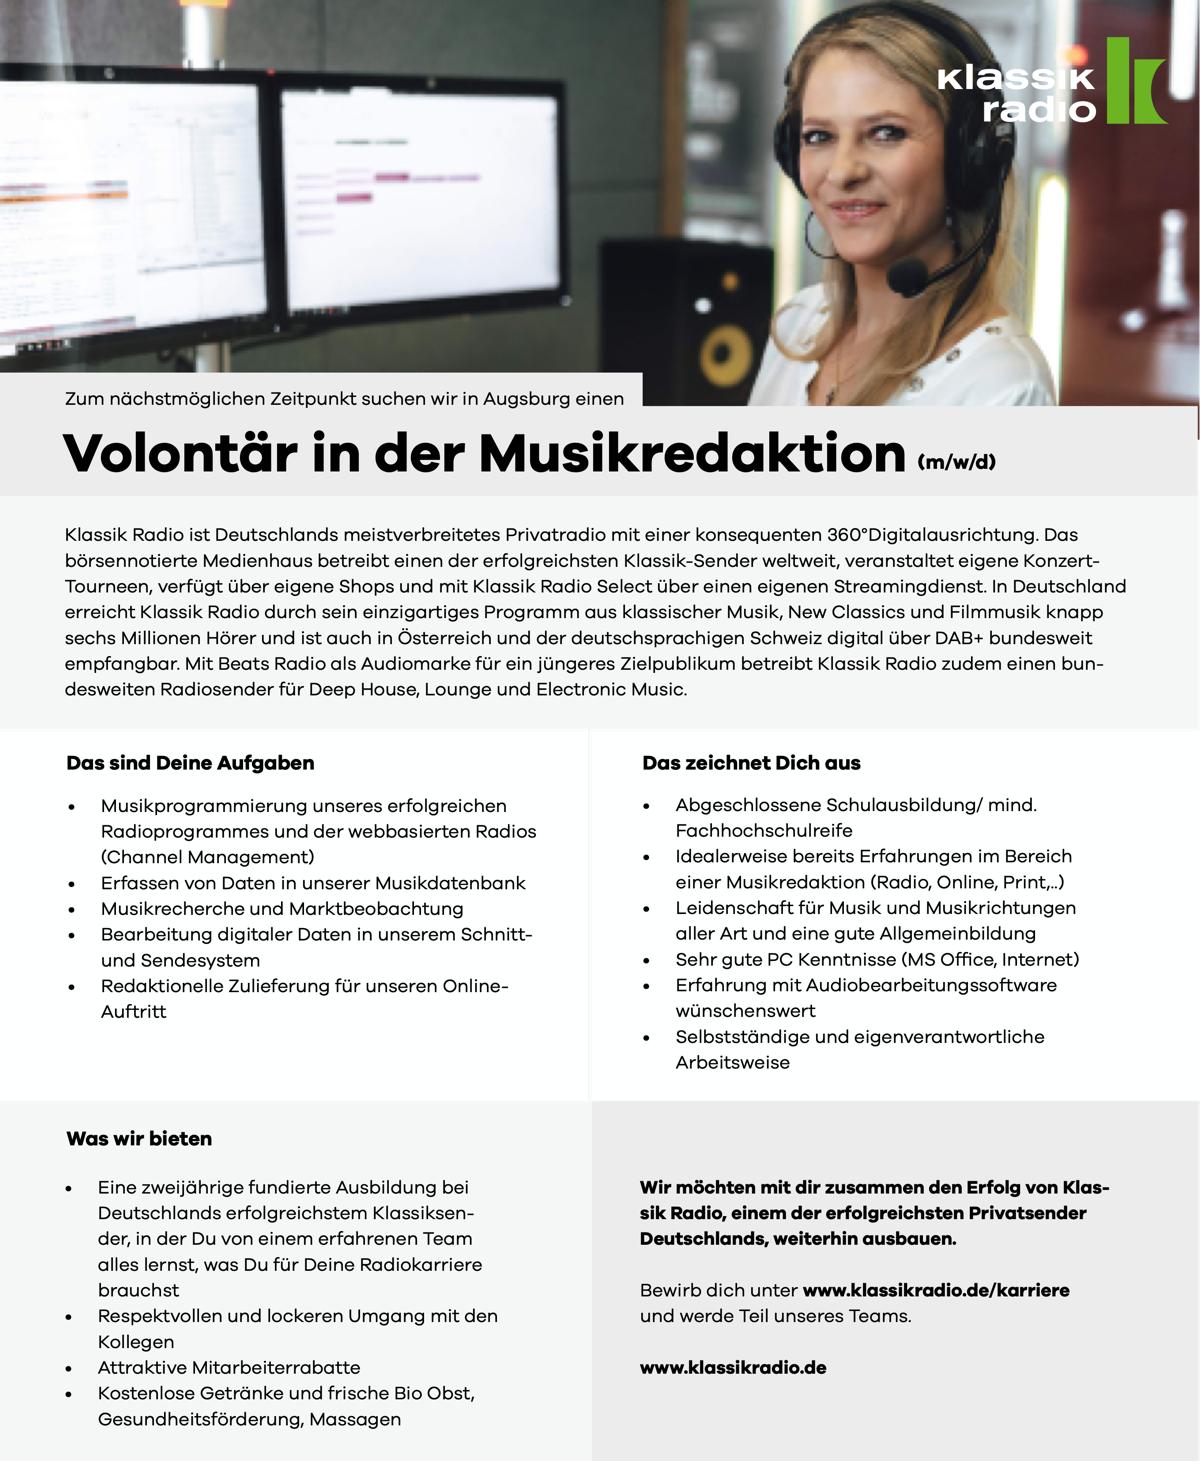 Klassik Radio sucht Volontär in der Musikredaktion (m/w/d)